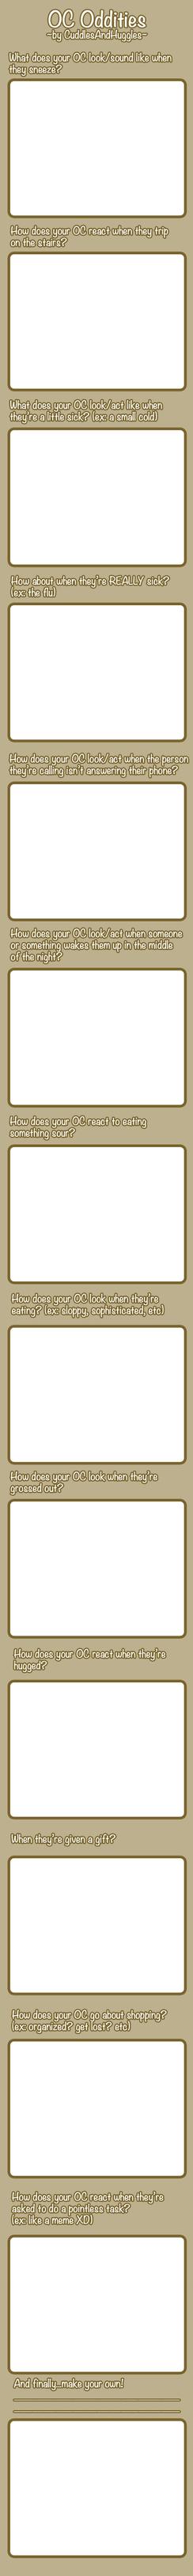 MEME: OC Oddities by CuddlesAndHuggles